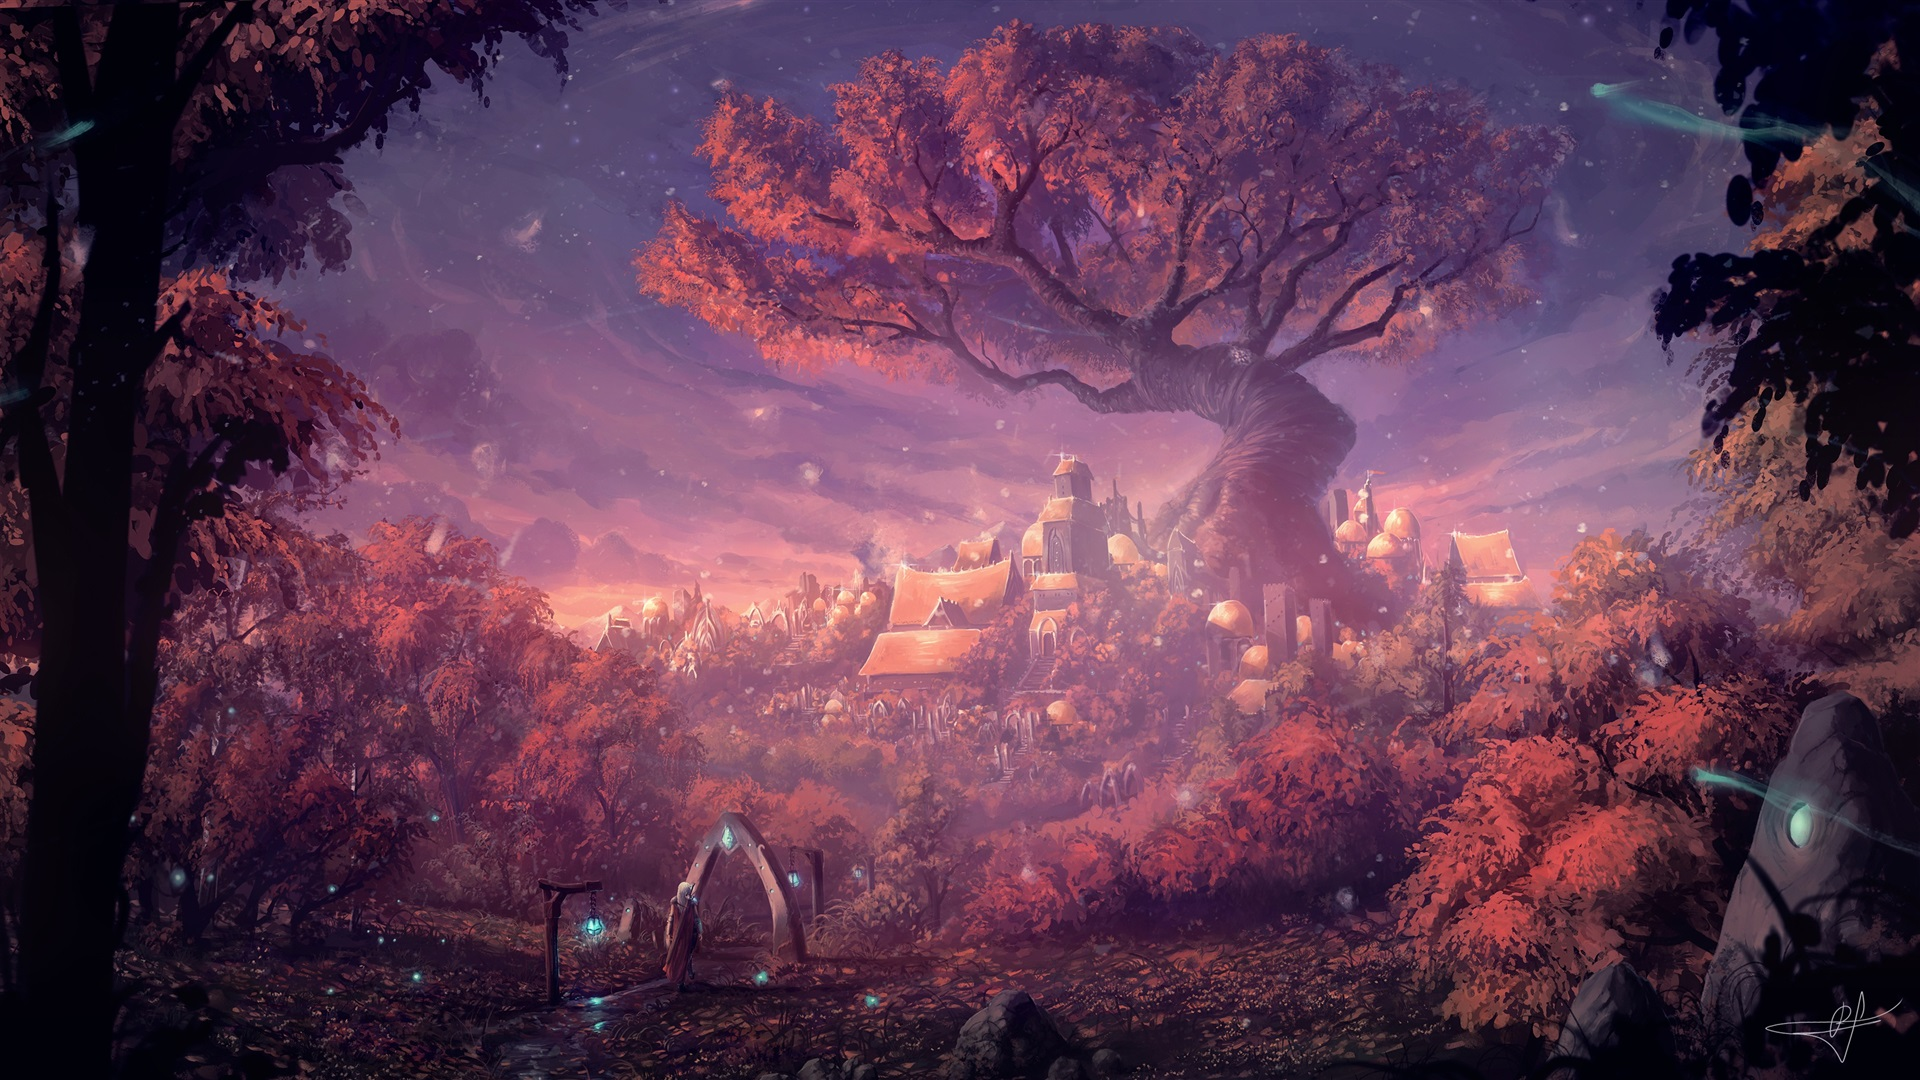 Wallpaper Fantasy Forest City Gate Forest Houses Art